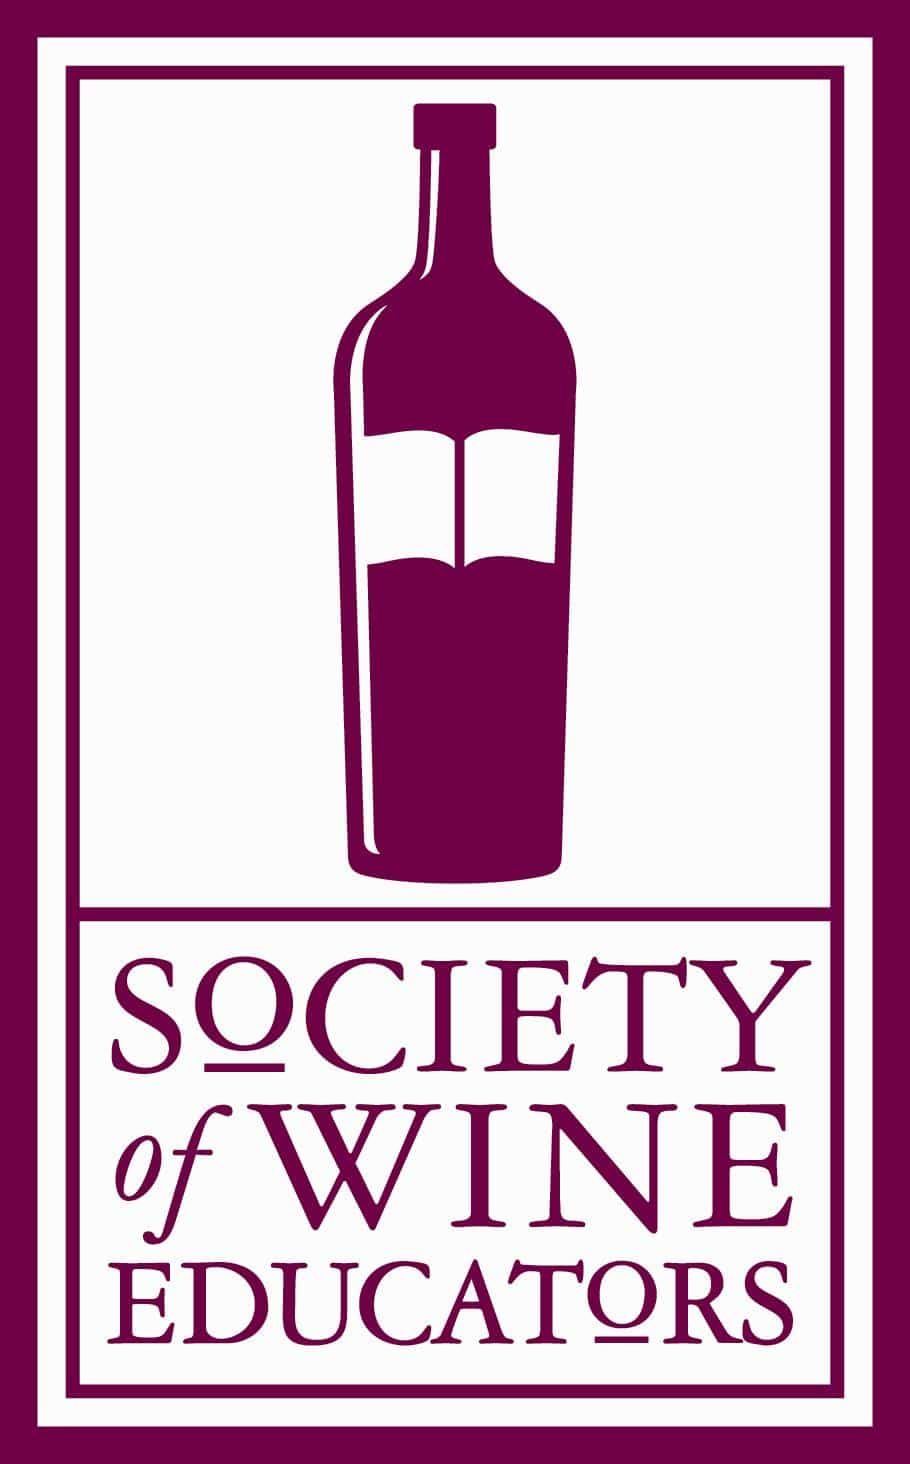 Society-of-Wine-Educators.jpg